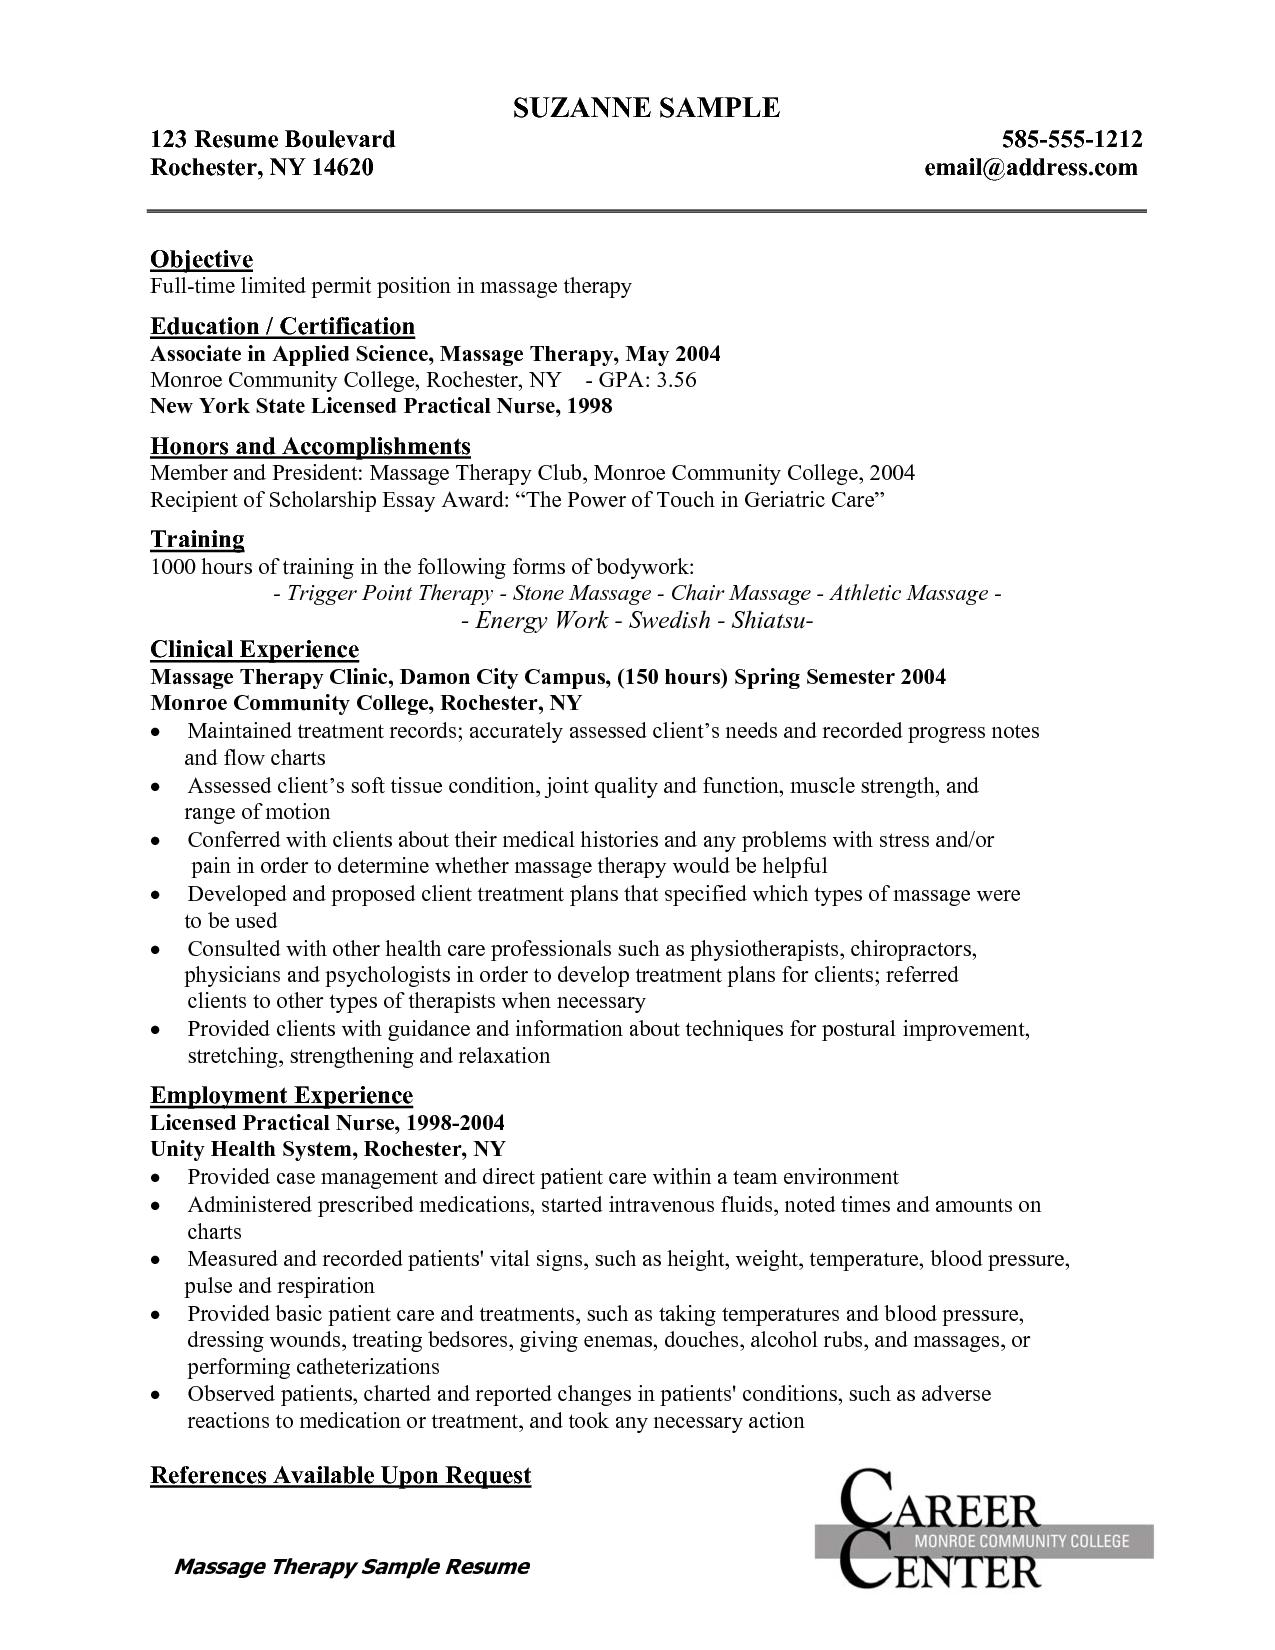 sample nursing student resume resume best nursing quotes quotesgram - Resume Samples For Nursing Students